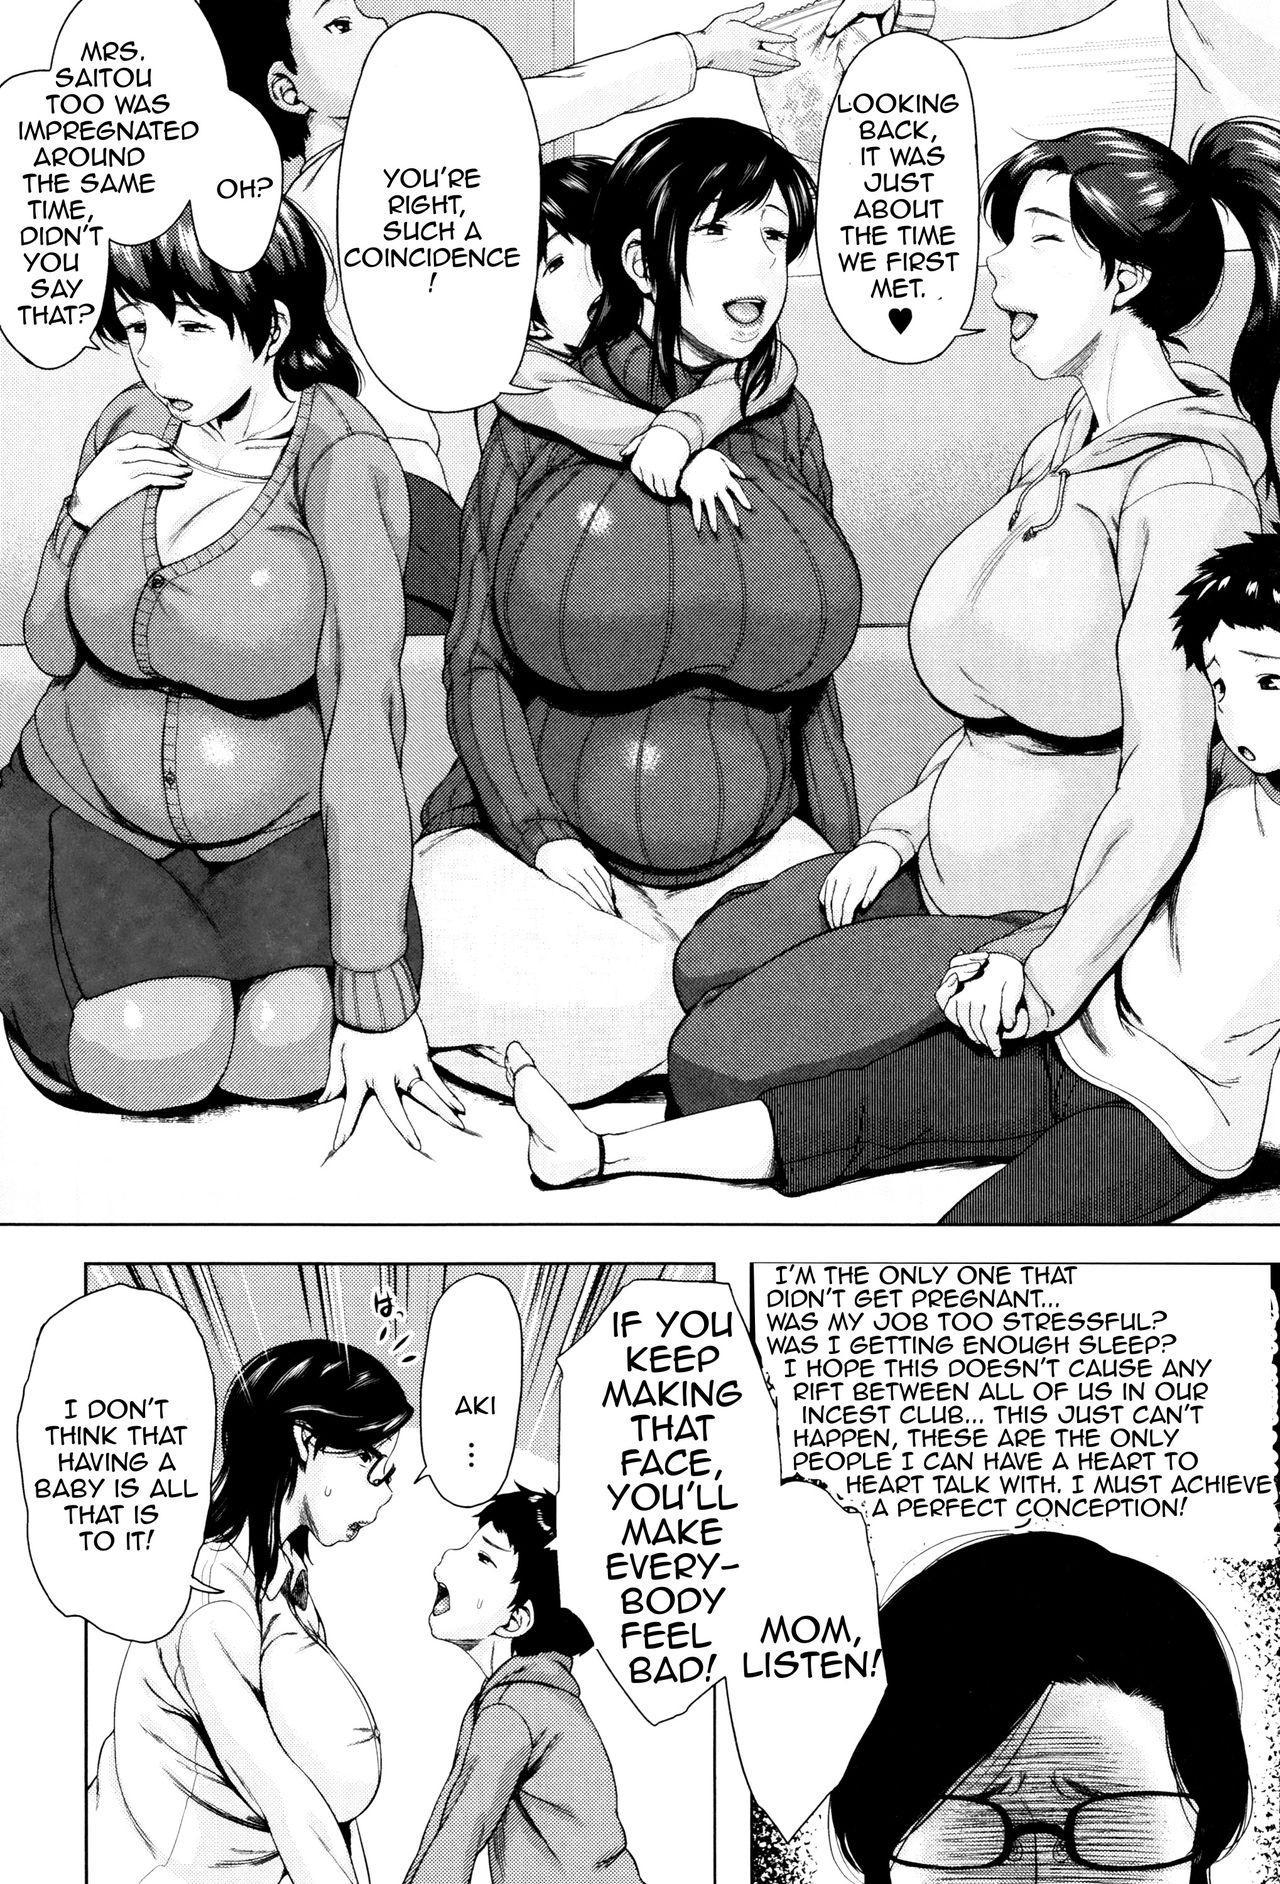 [Jitsuma] Kinyoubi no Haha-tachi e - To Friday's mothers [English] [Amoskandy, desudesu, Kusanyagi] 194